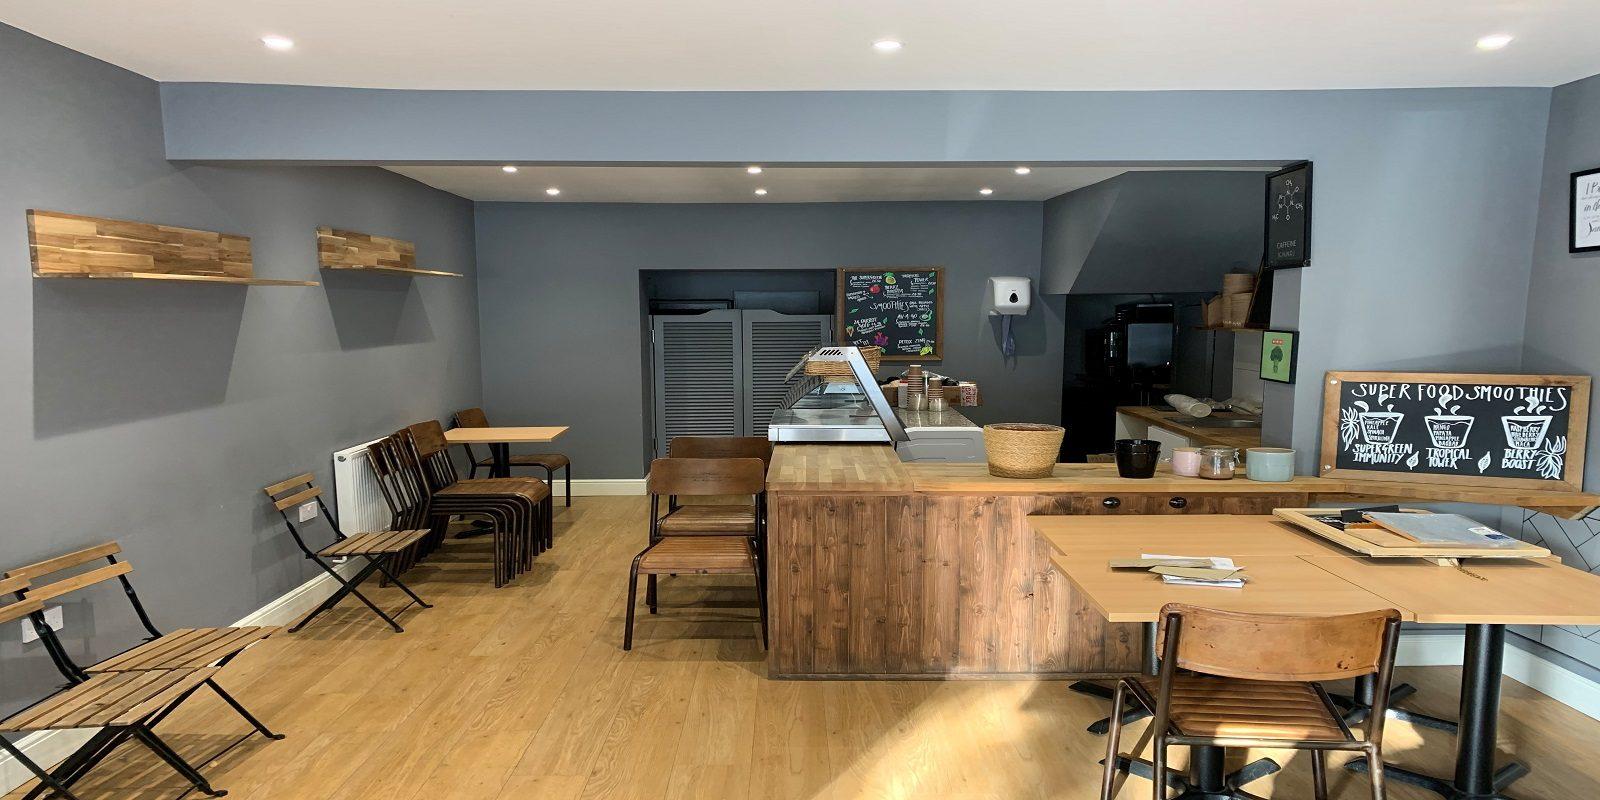 PRIME LOCATION RESTAURANT/CAFE TO LET IN CAMDEN